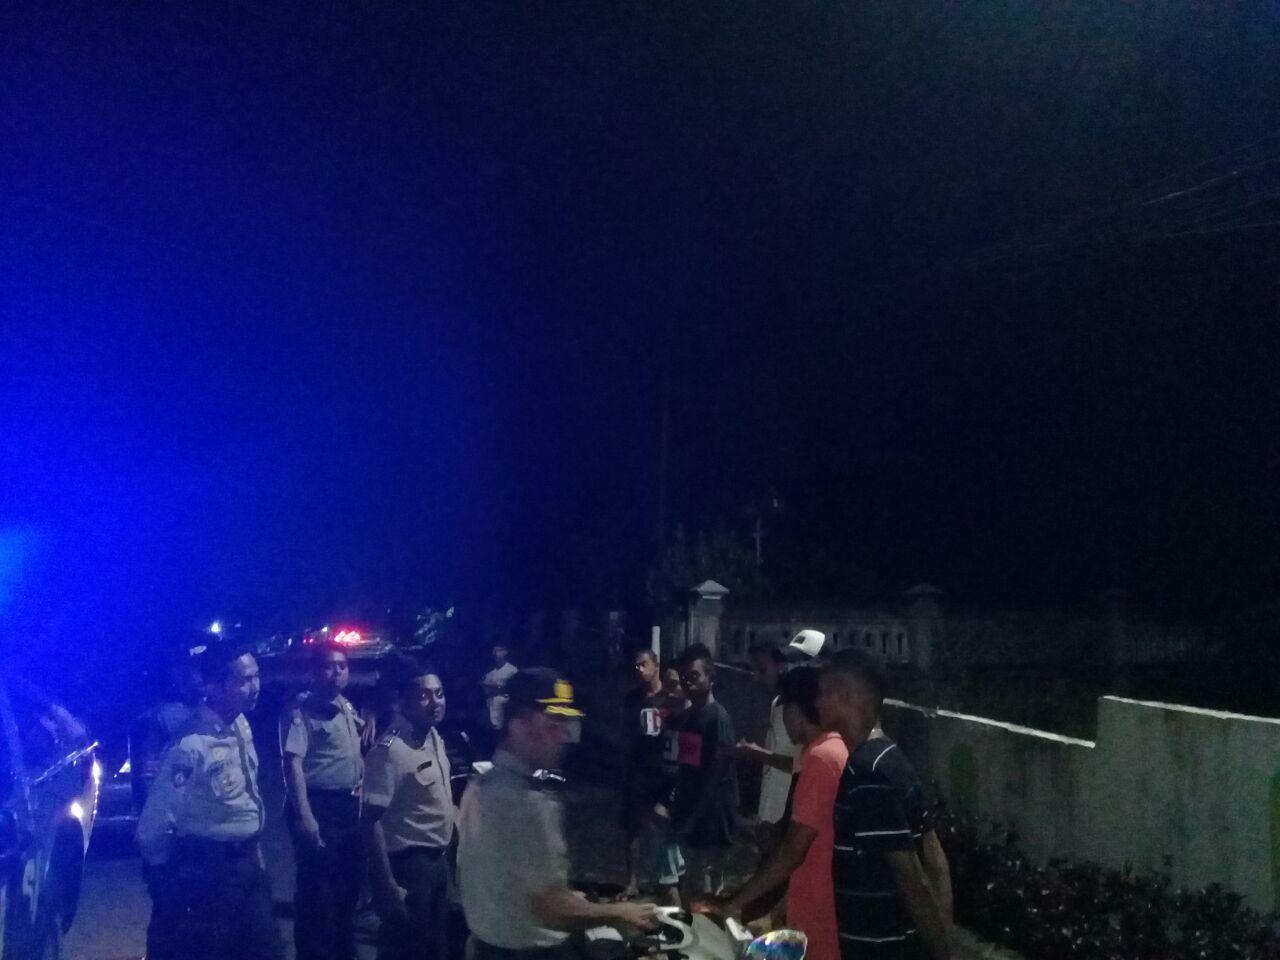 Antisipasi Gangguan Kamtibmas, Polres Alor Laksanakan Patroli Malam